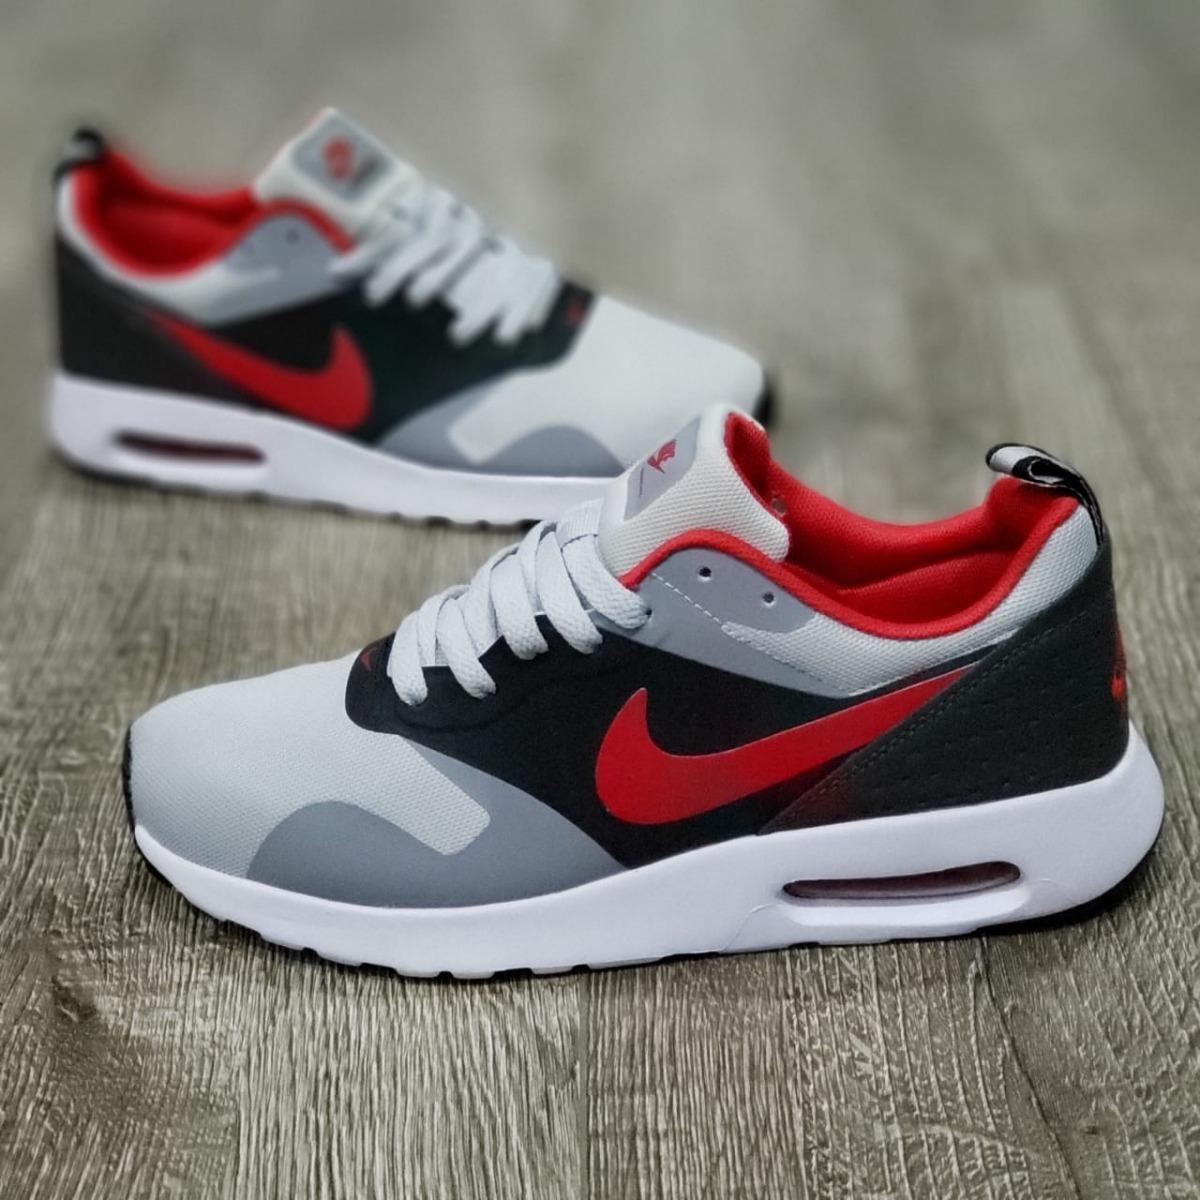 Tenis Nike Air Max Thea Black Deportivos Para Hombre